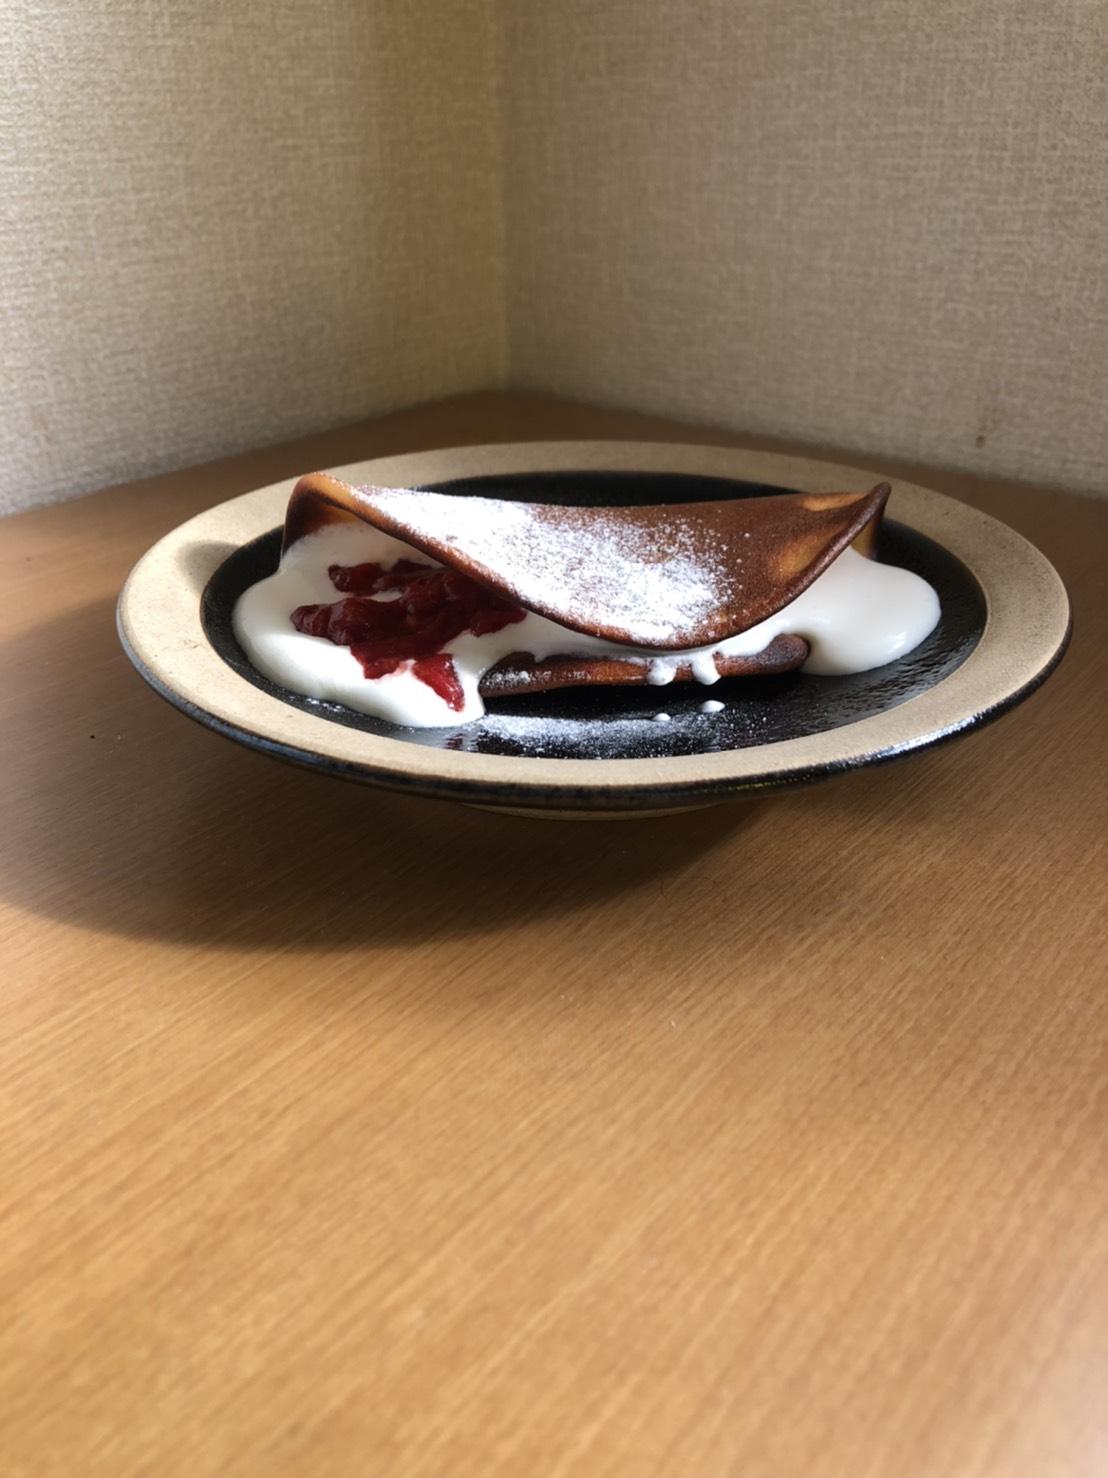 a-ta-sante糖質制限パン料理教室。阿倍野区。桃ヶ池町。a-ta-sant'e.オンラインレッスン。りのパウダー。低糖質パンケーキ。低糖食コーディネーター。江部粉パンの第一人者。低糖質料理教室。利野郁枝。